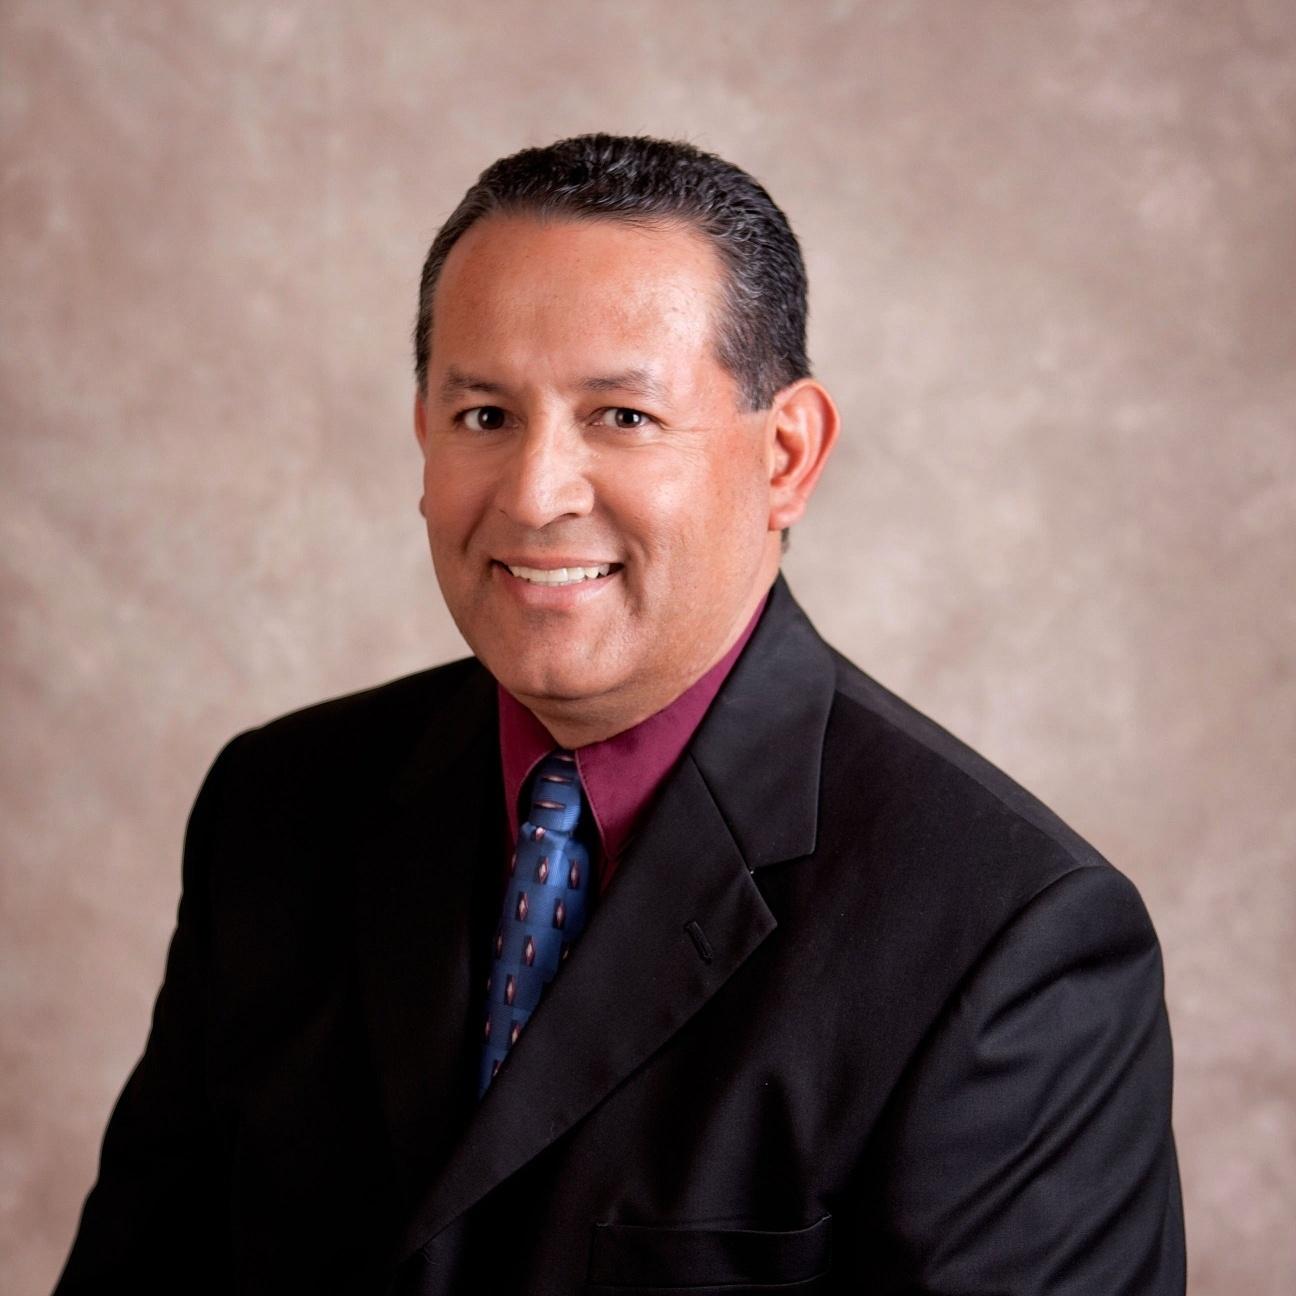 Roy Quintanar